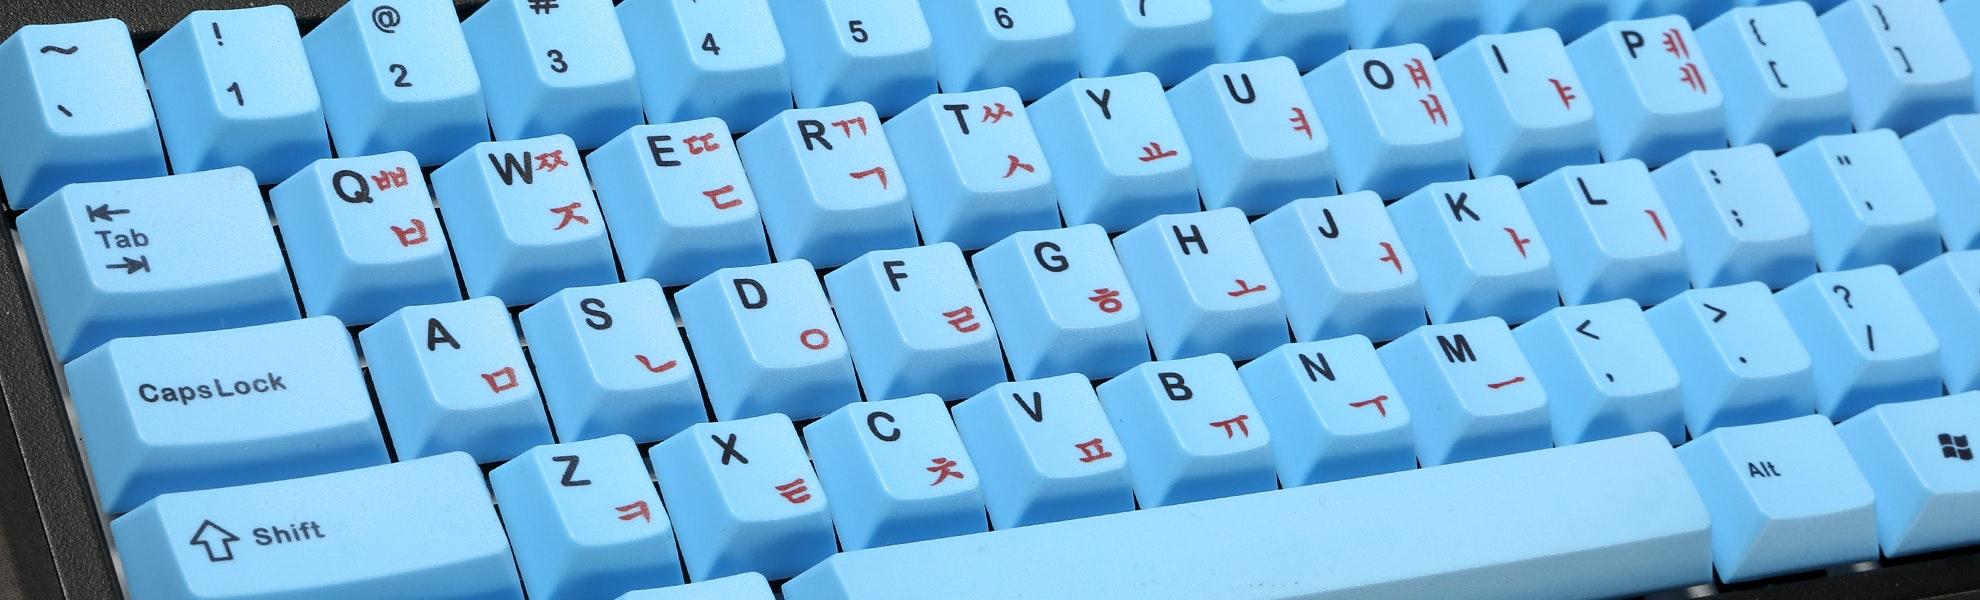 IMSTO PBT Keycaps with Hangul